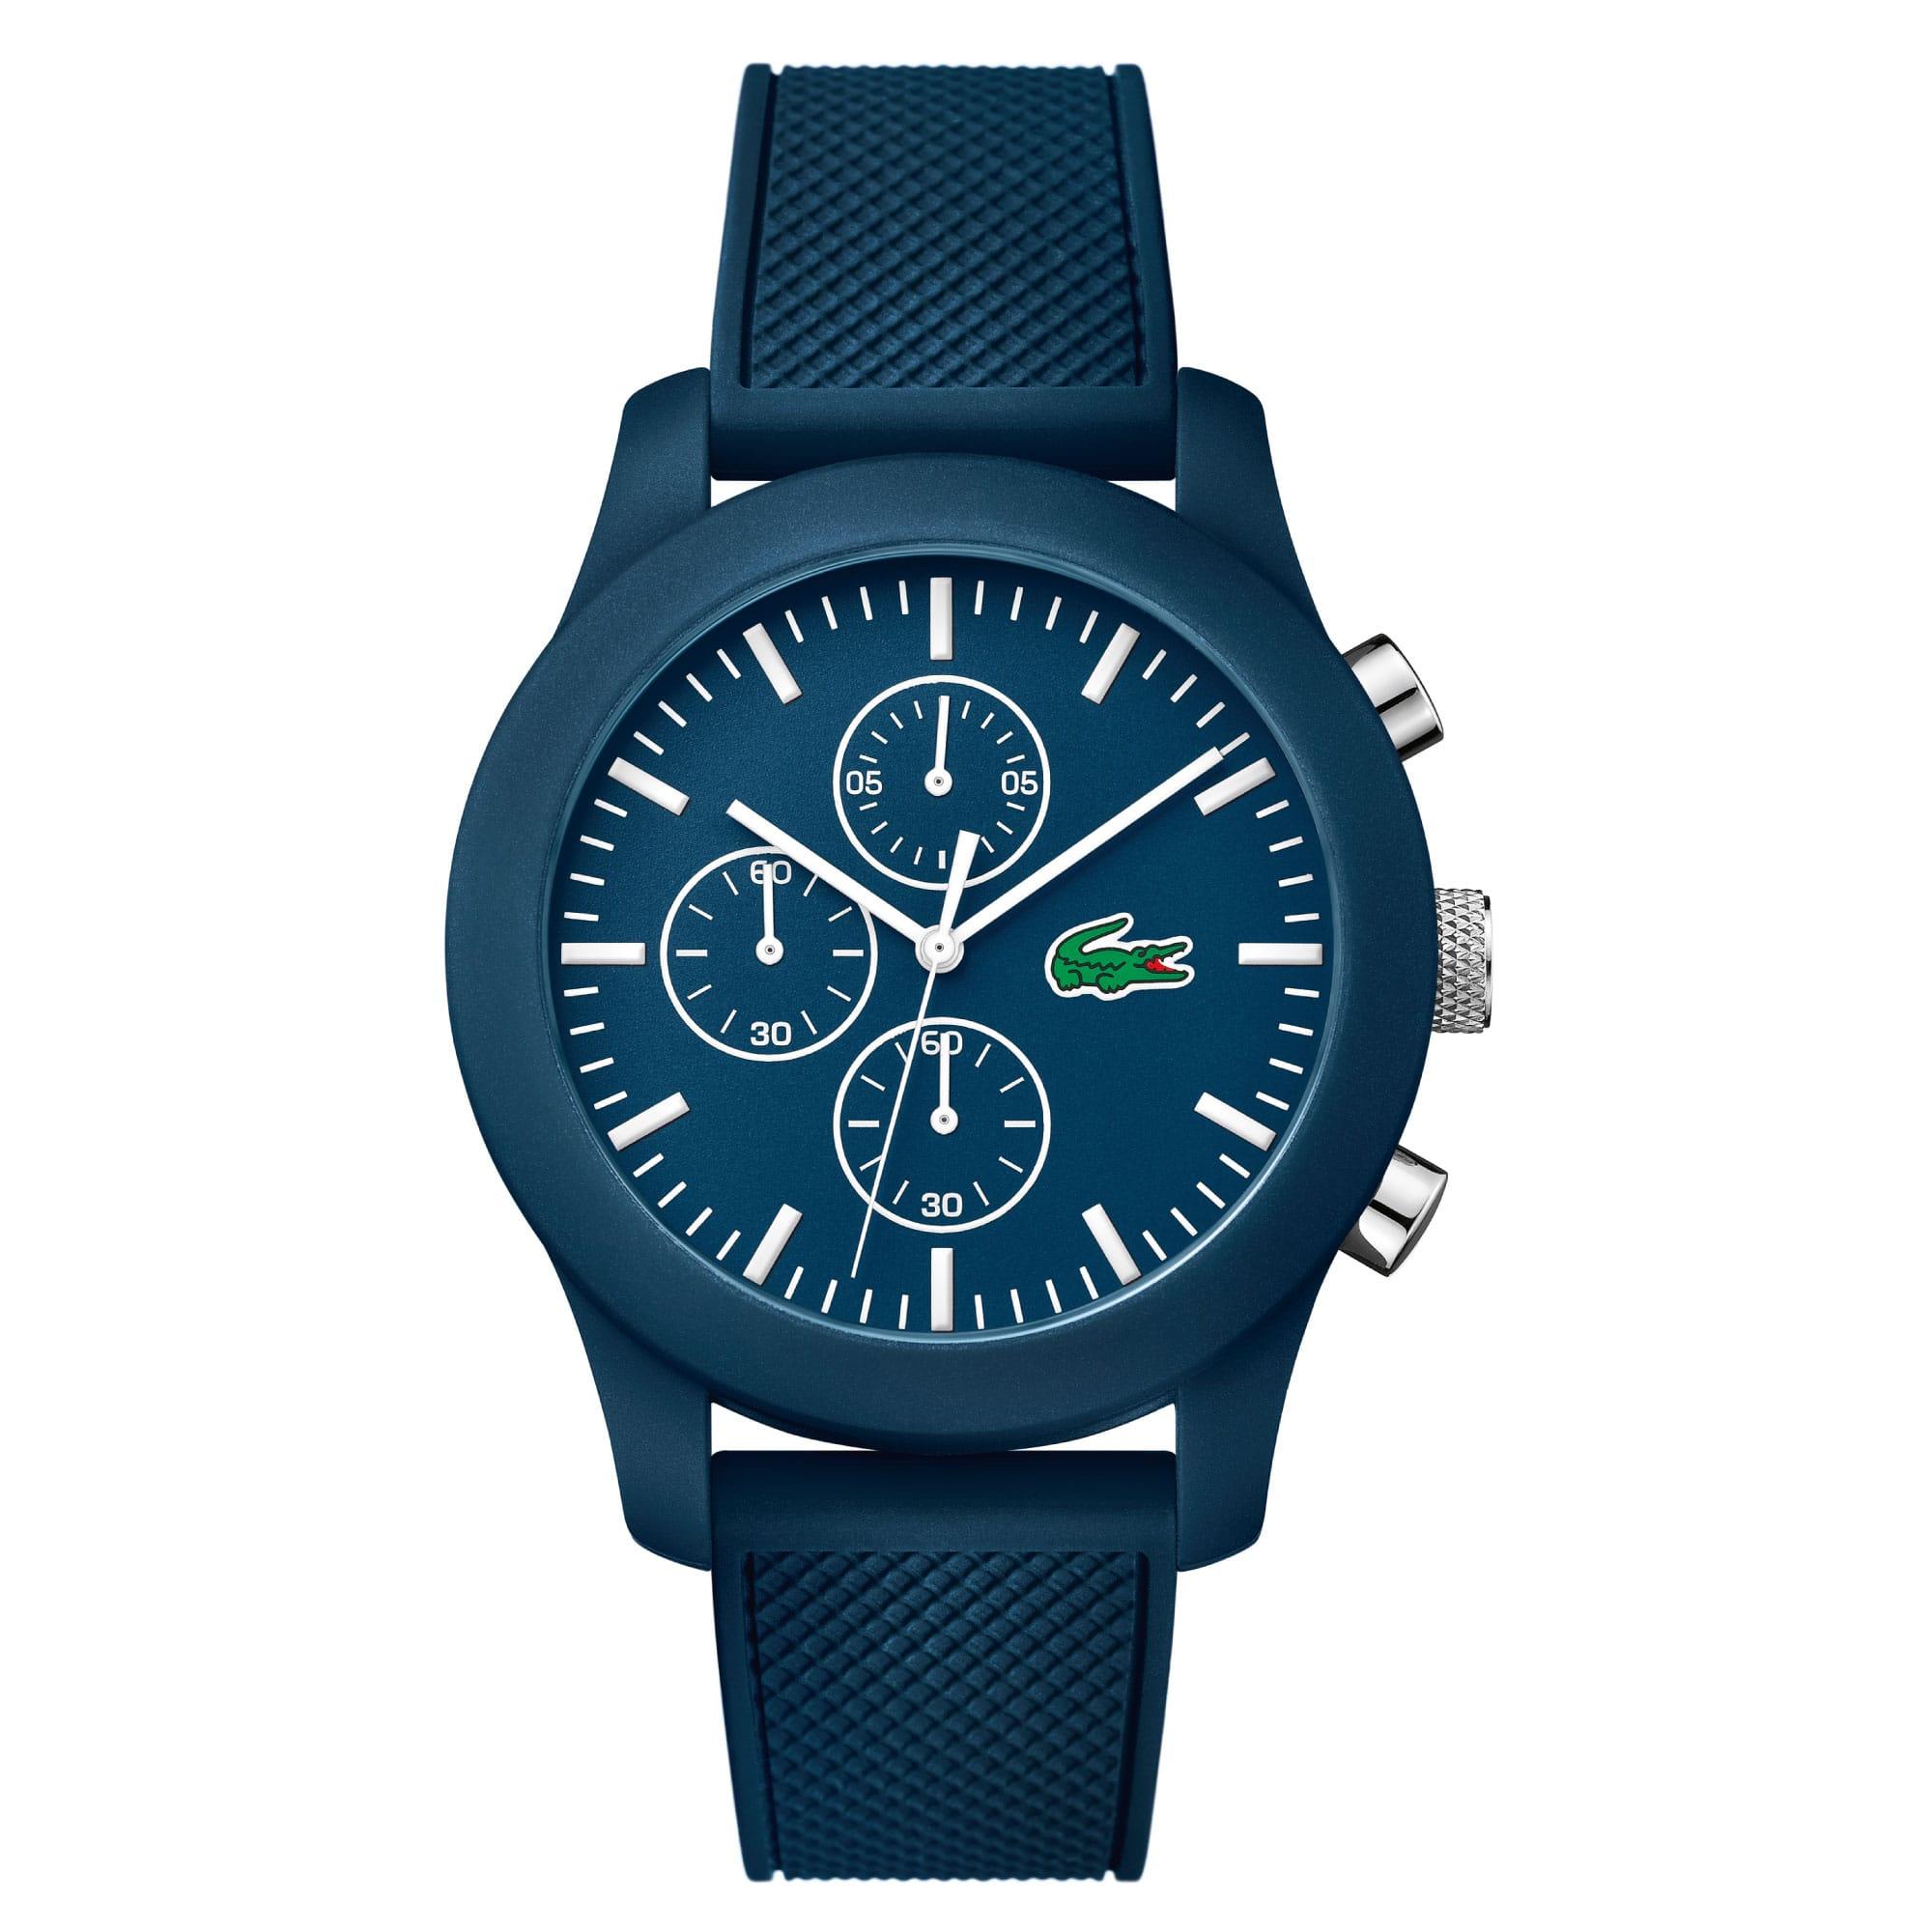 Unisex Lacoste.12.12 Chronograph Blue Watch